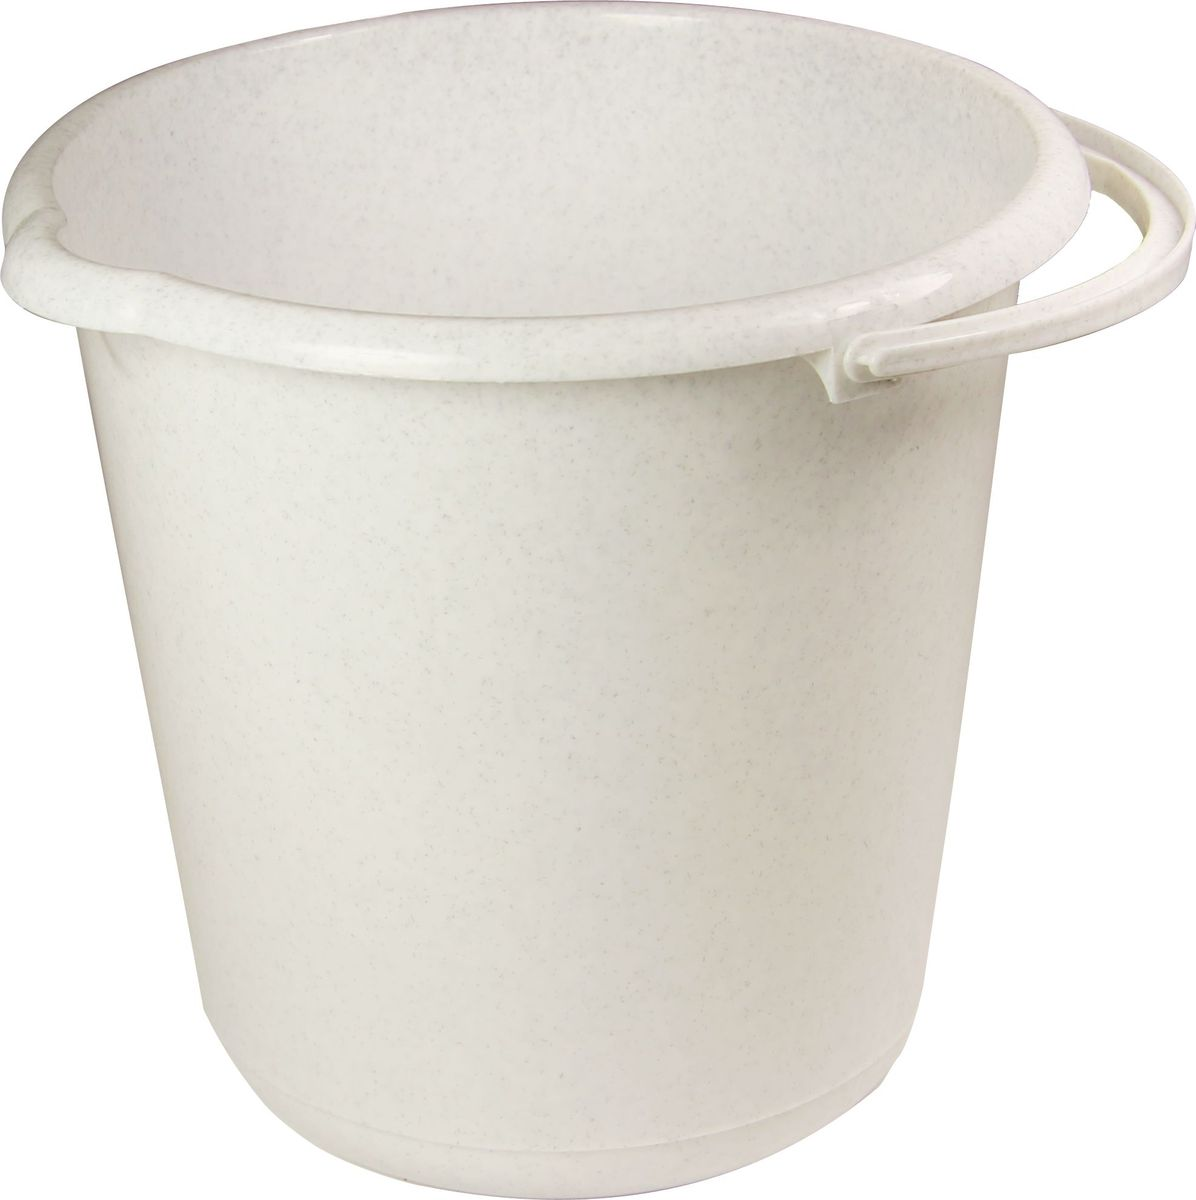 Ведро хозяйственное Idea, цвет: мраморный, 15 л ведро хозяйственное idea цвет аквамарин 3 л м 2428